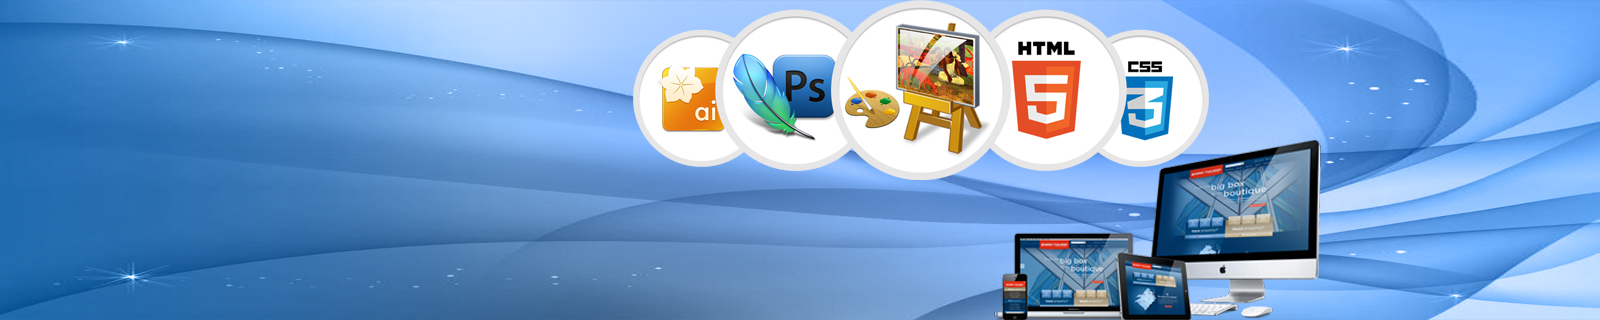 freelance Web designer hyderabad